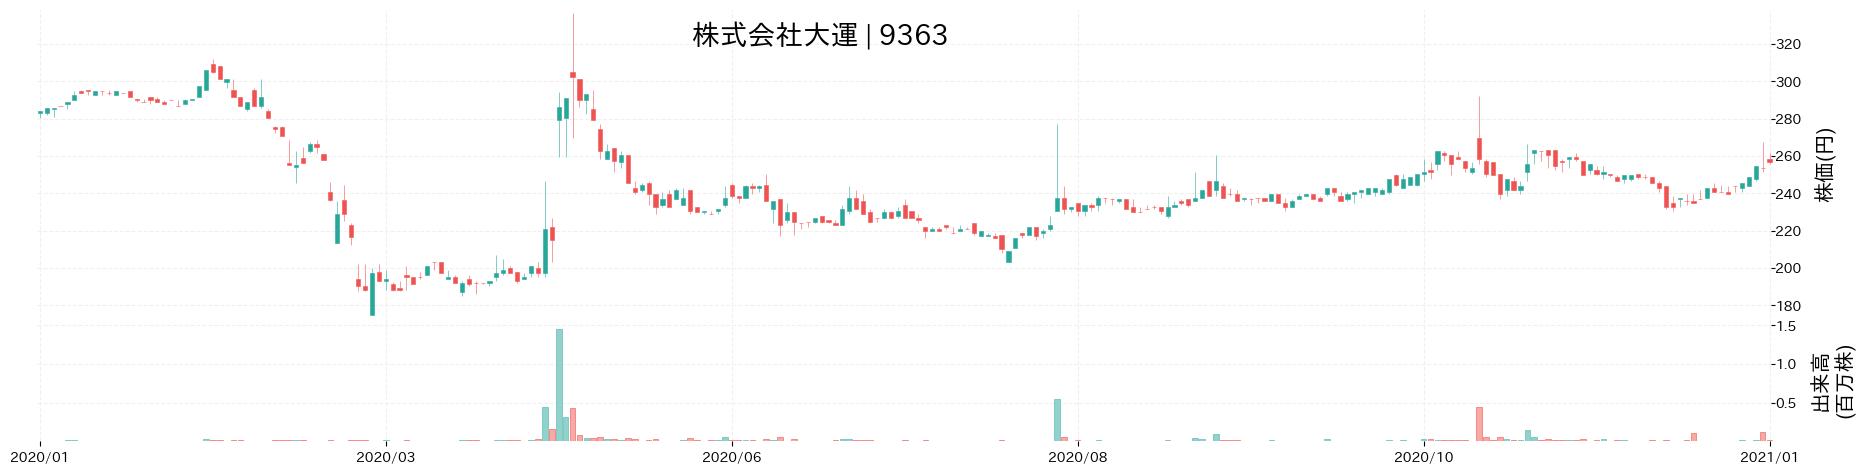 株式会社大運の株価推移(2020)